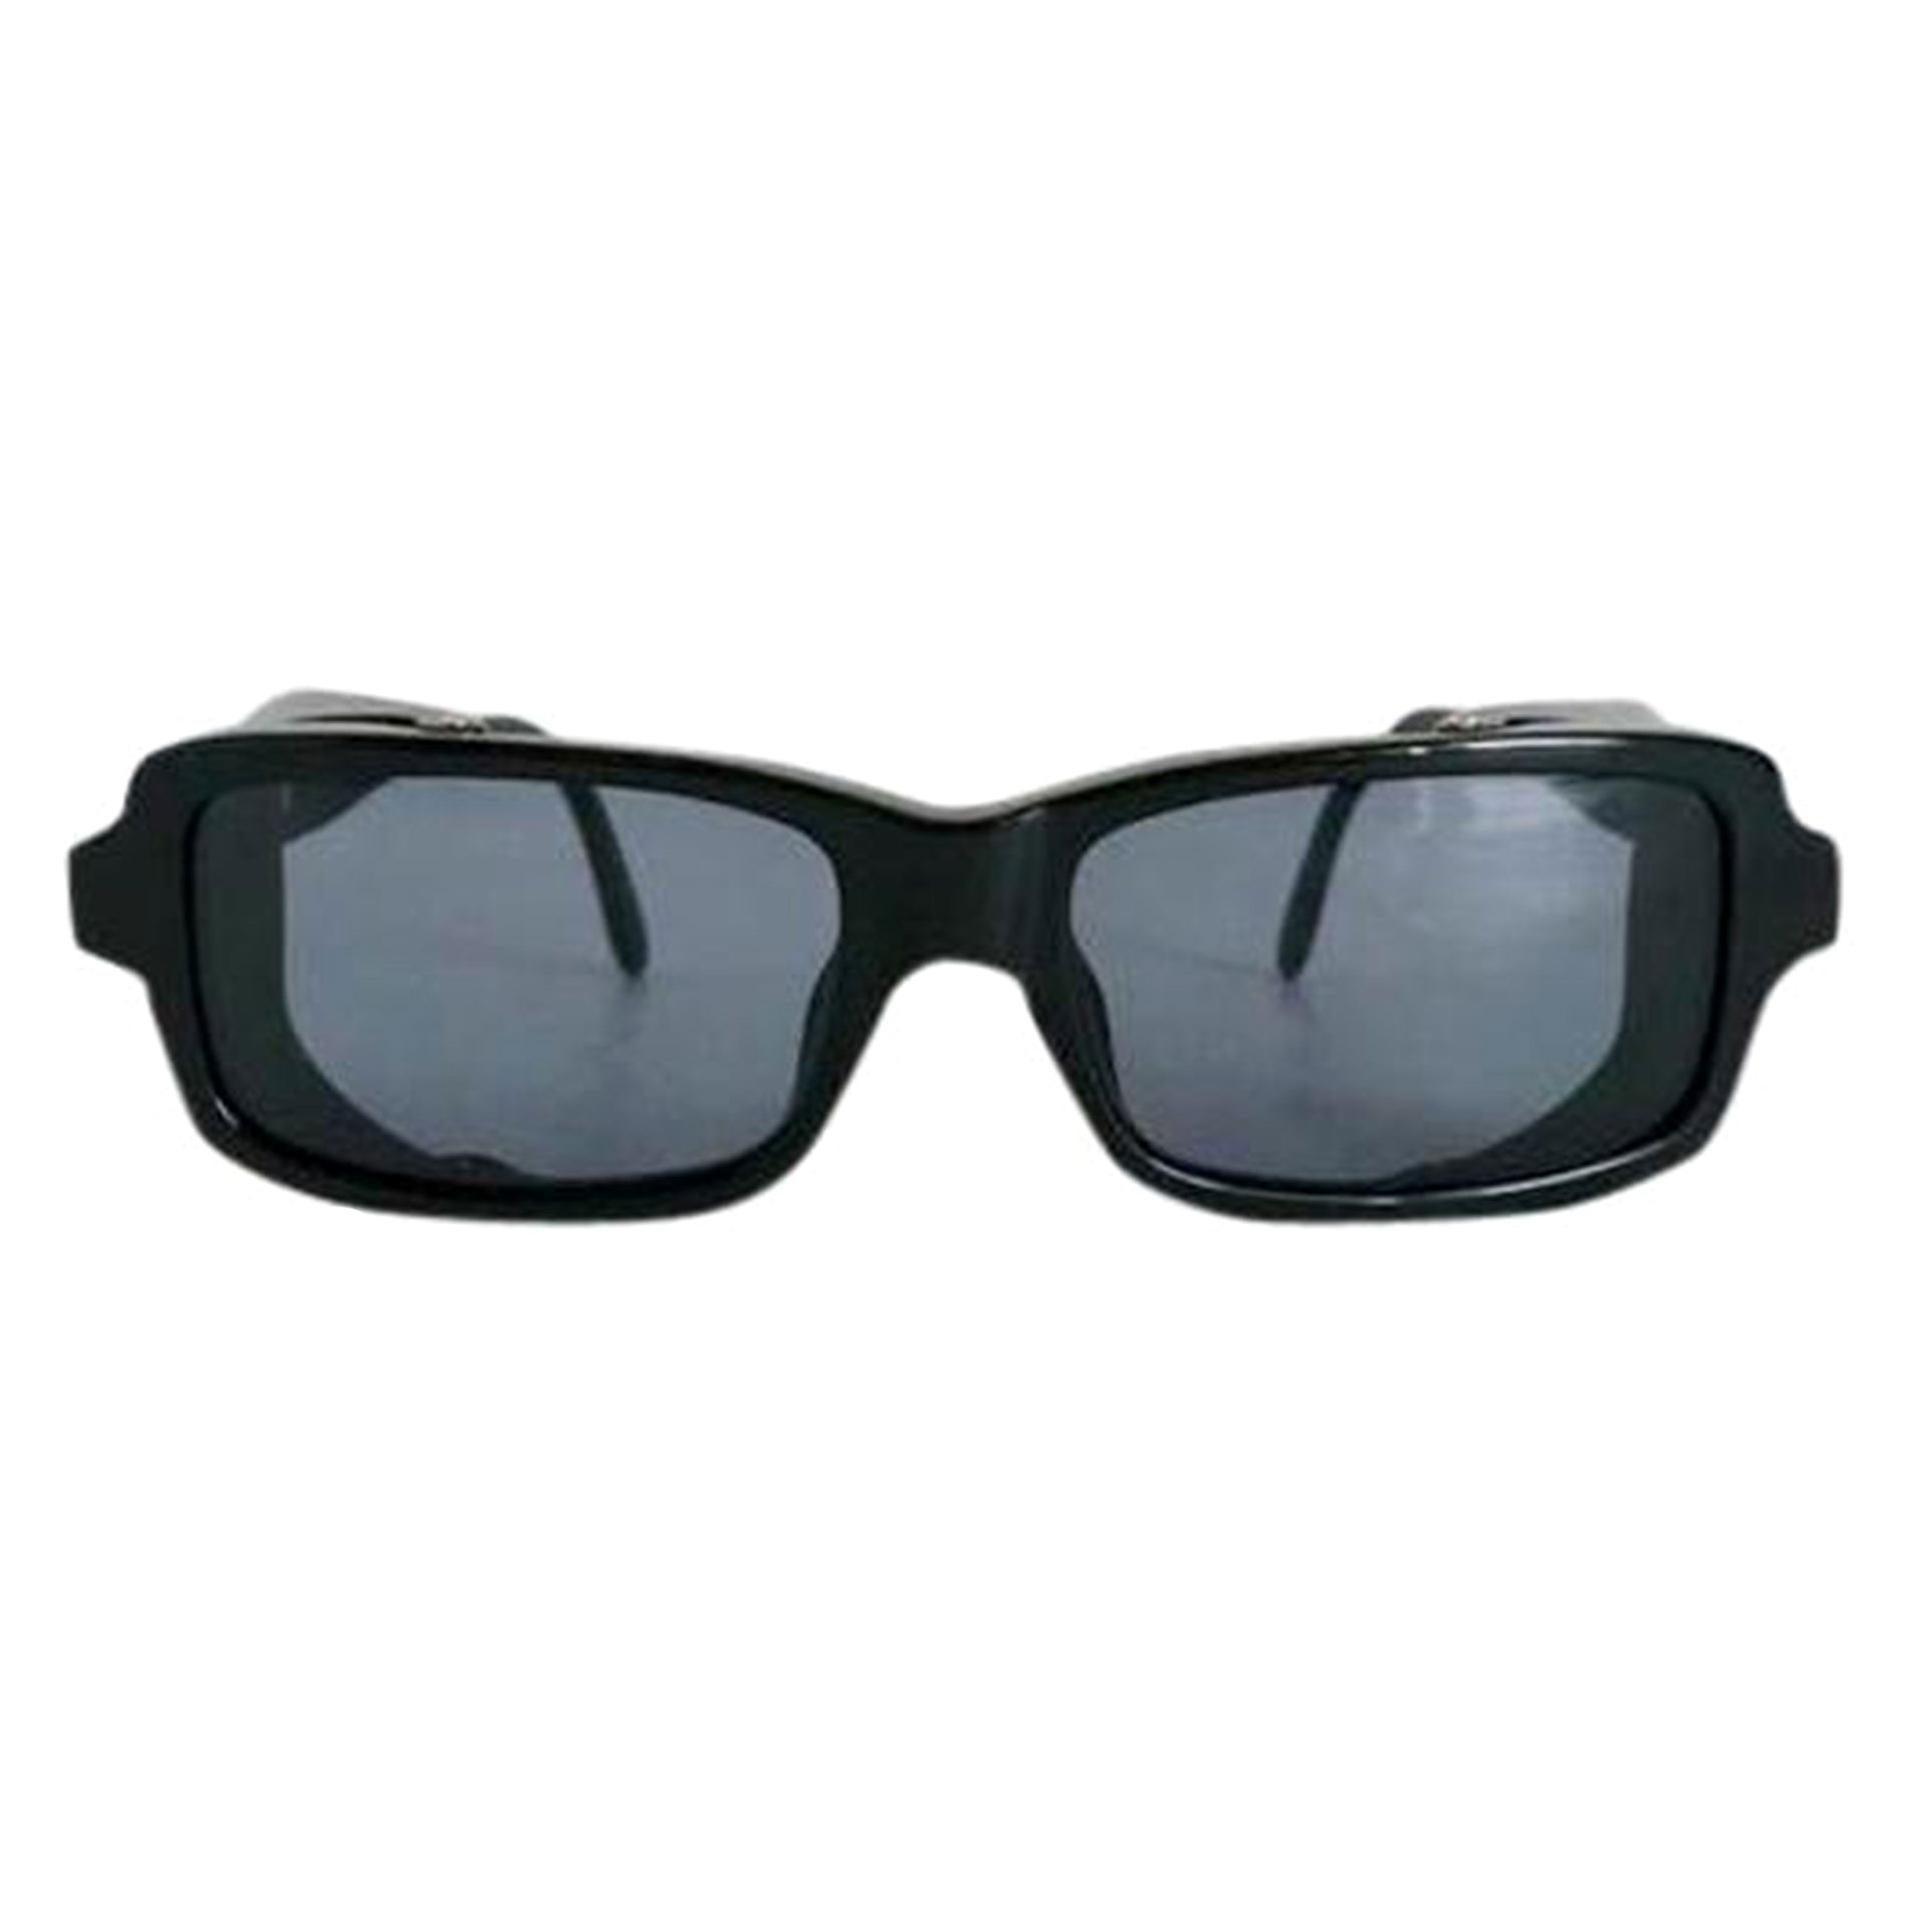 Chanel Black Vintage Sunglasses